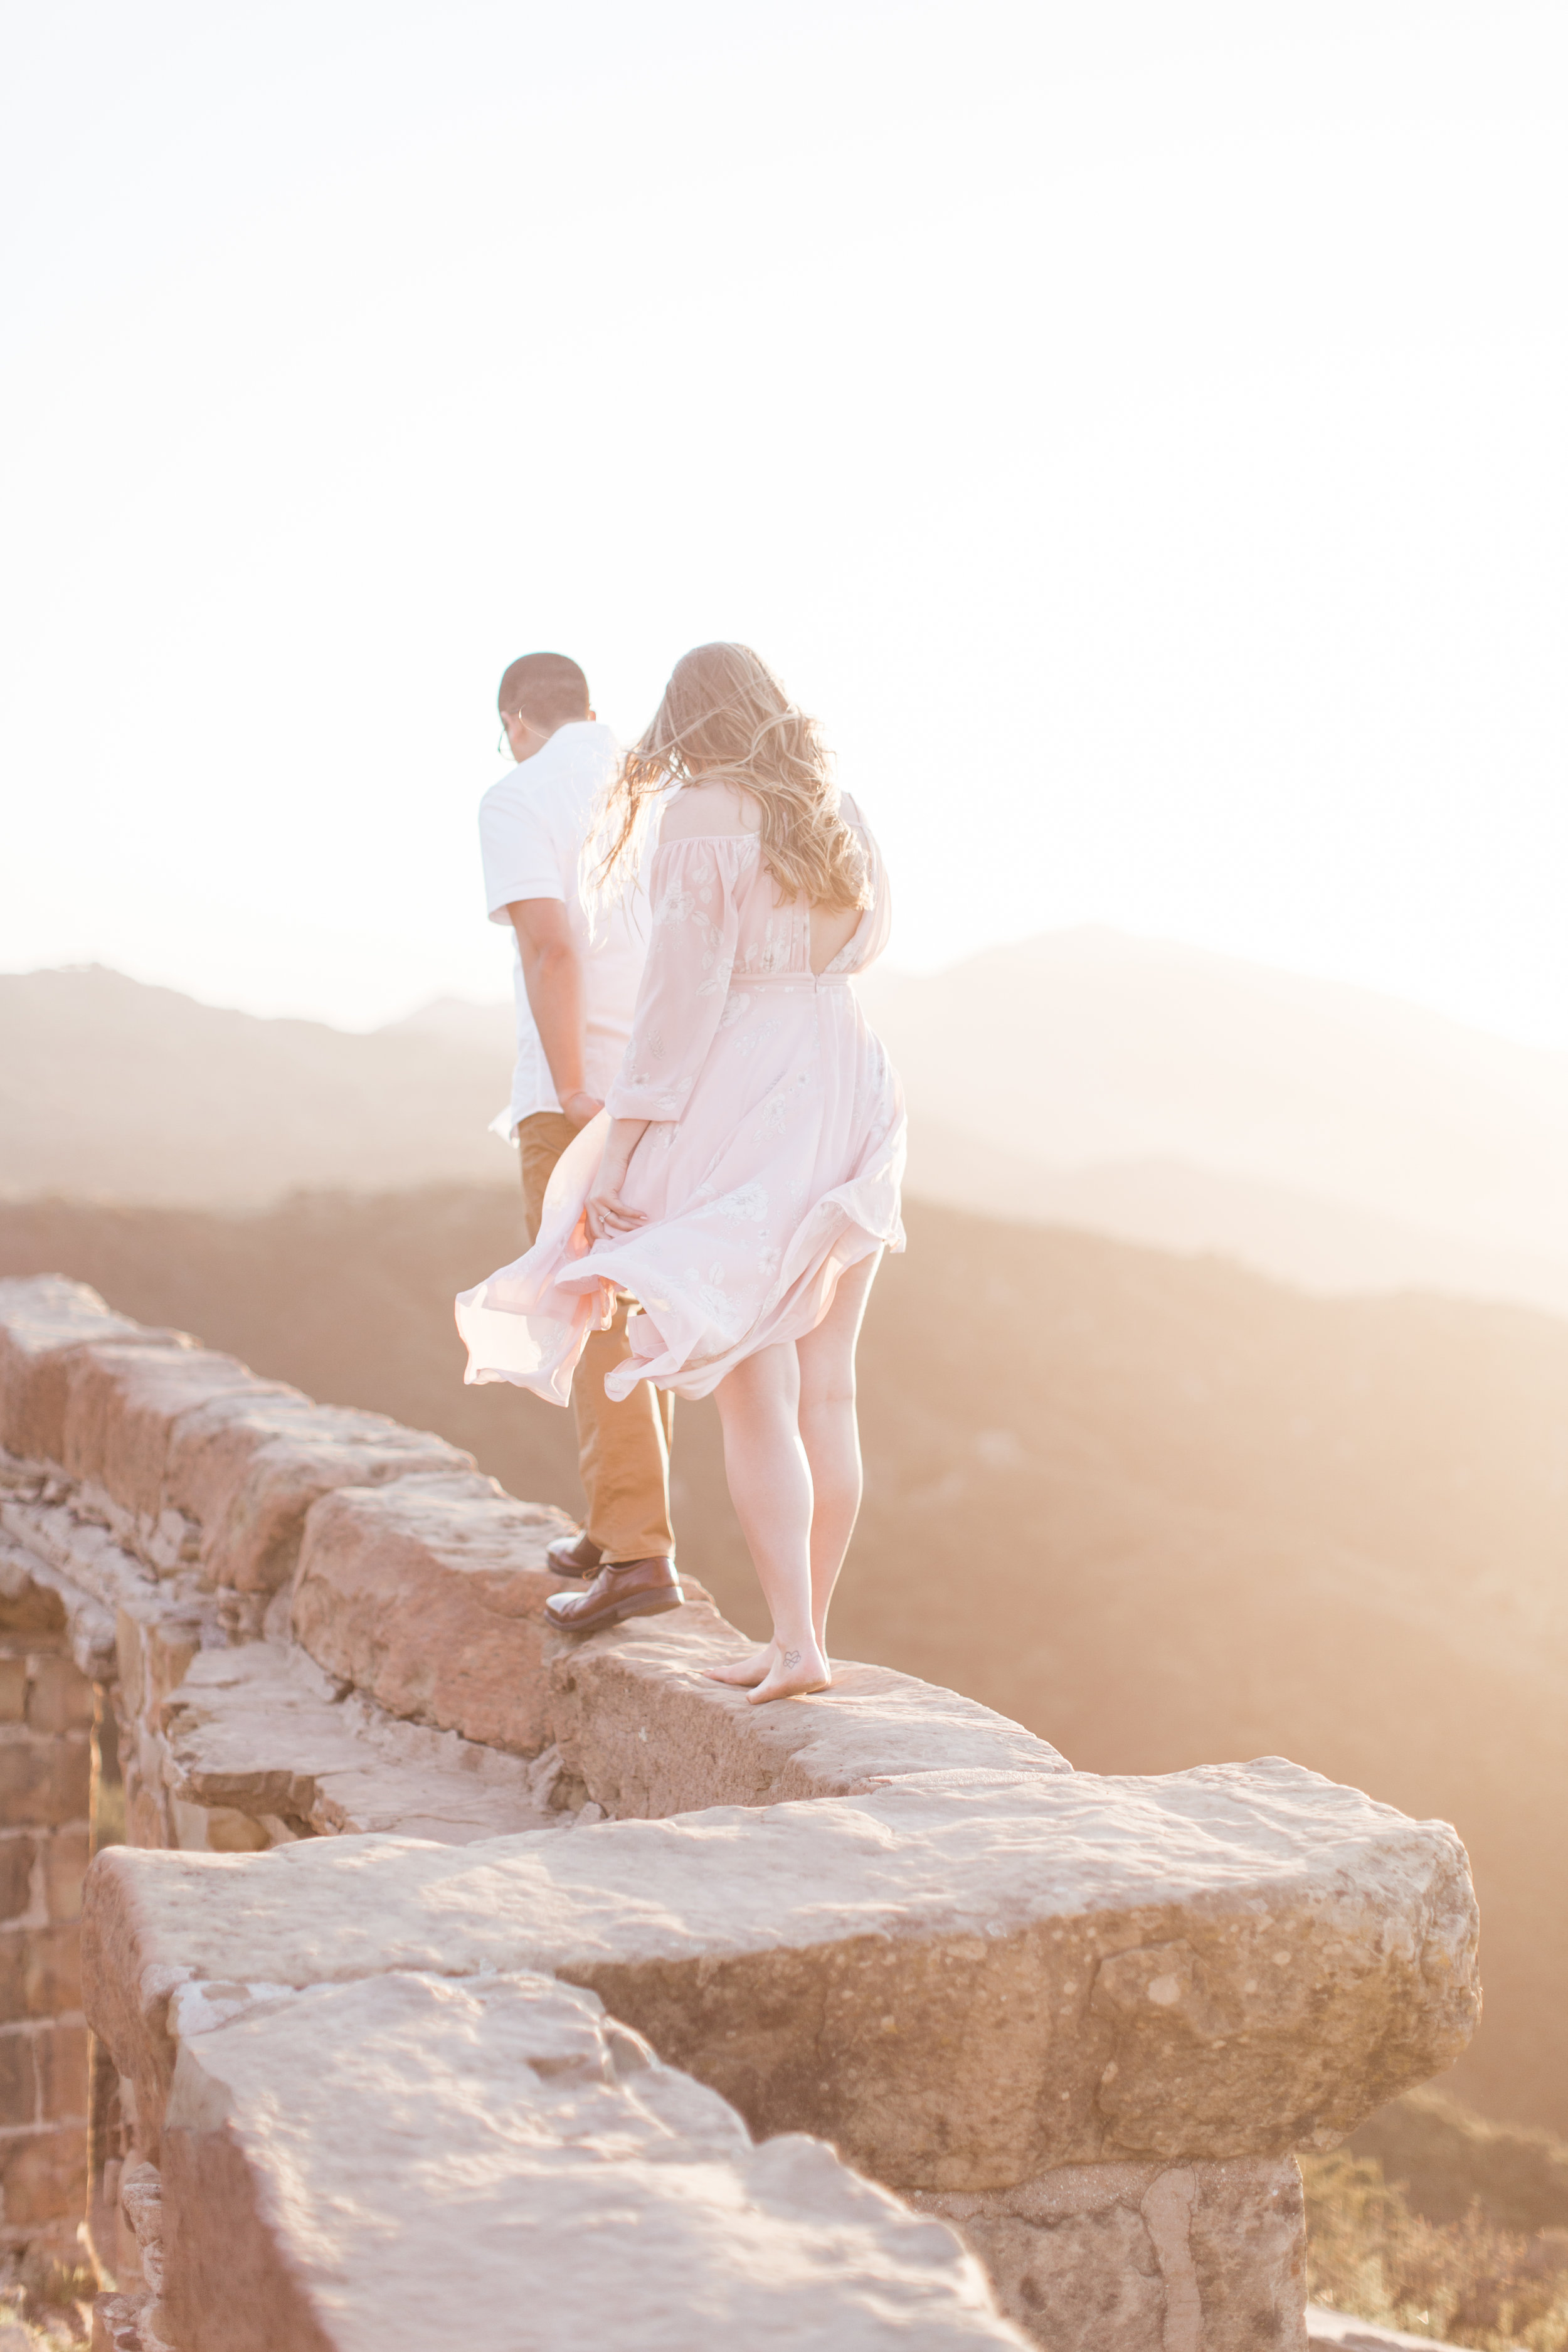 Santa Barbara Mountains Engagement Photos - The Overwhelmed Bride Wedding Blog